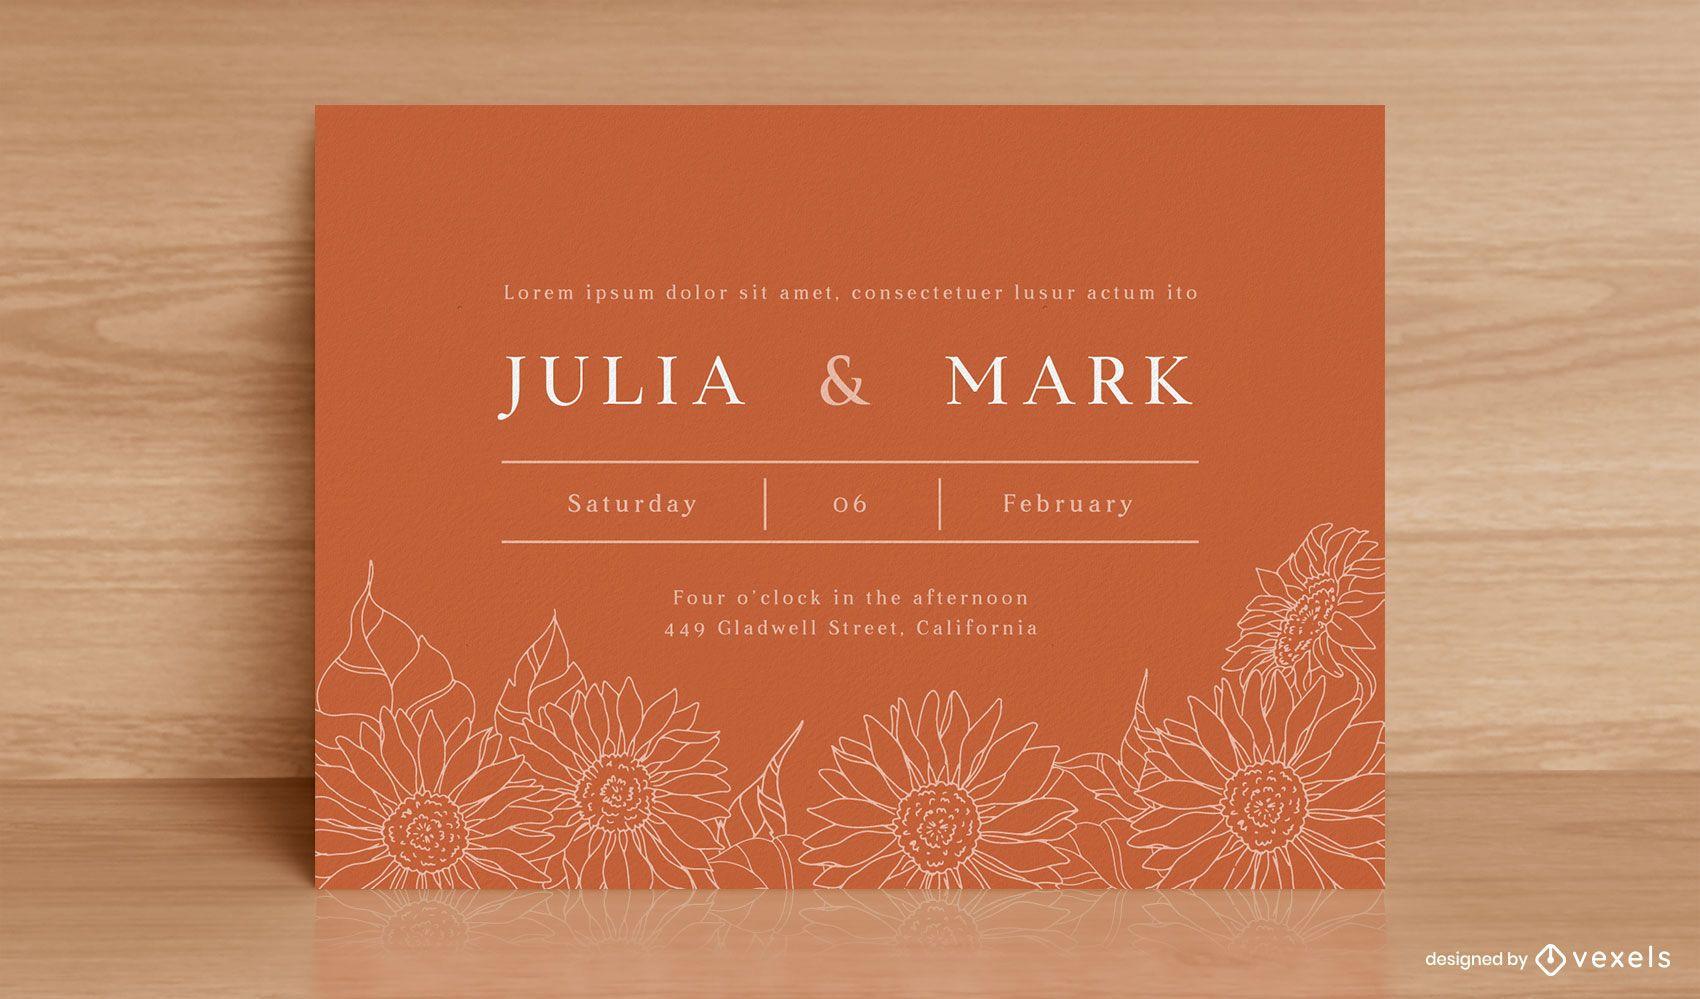 Line art sunflowers wedding invitation design